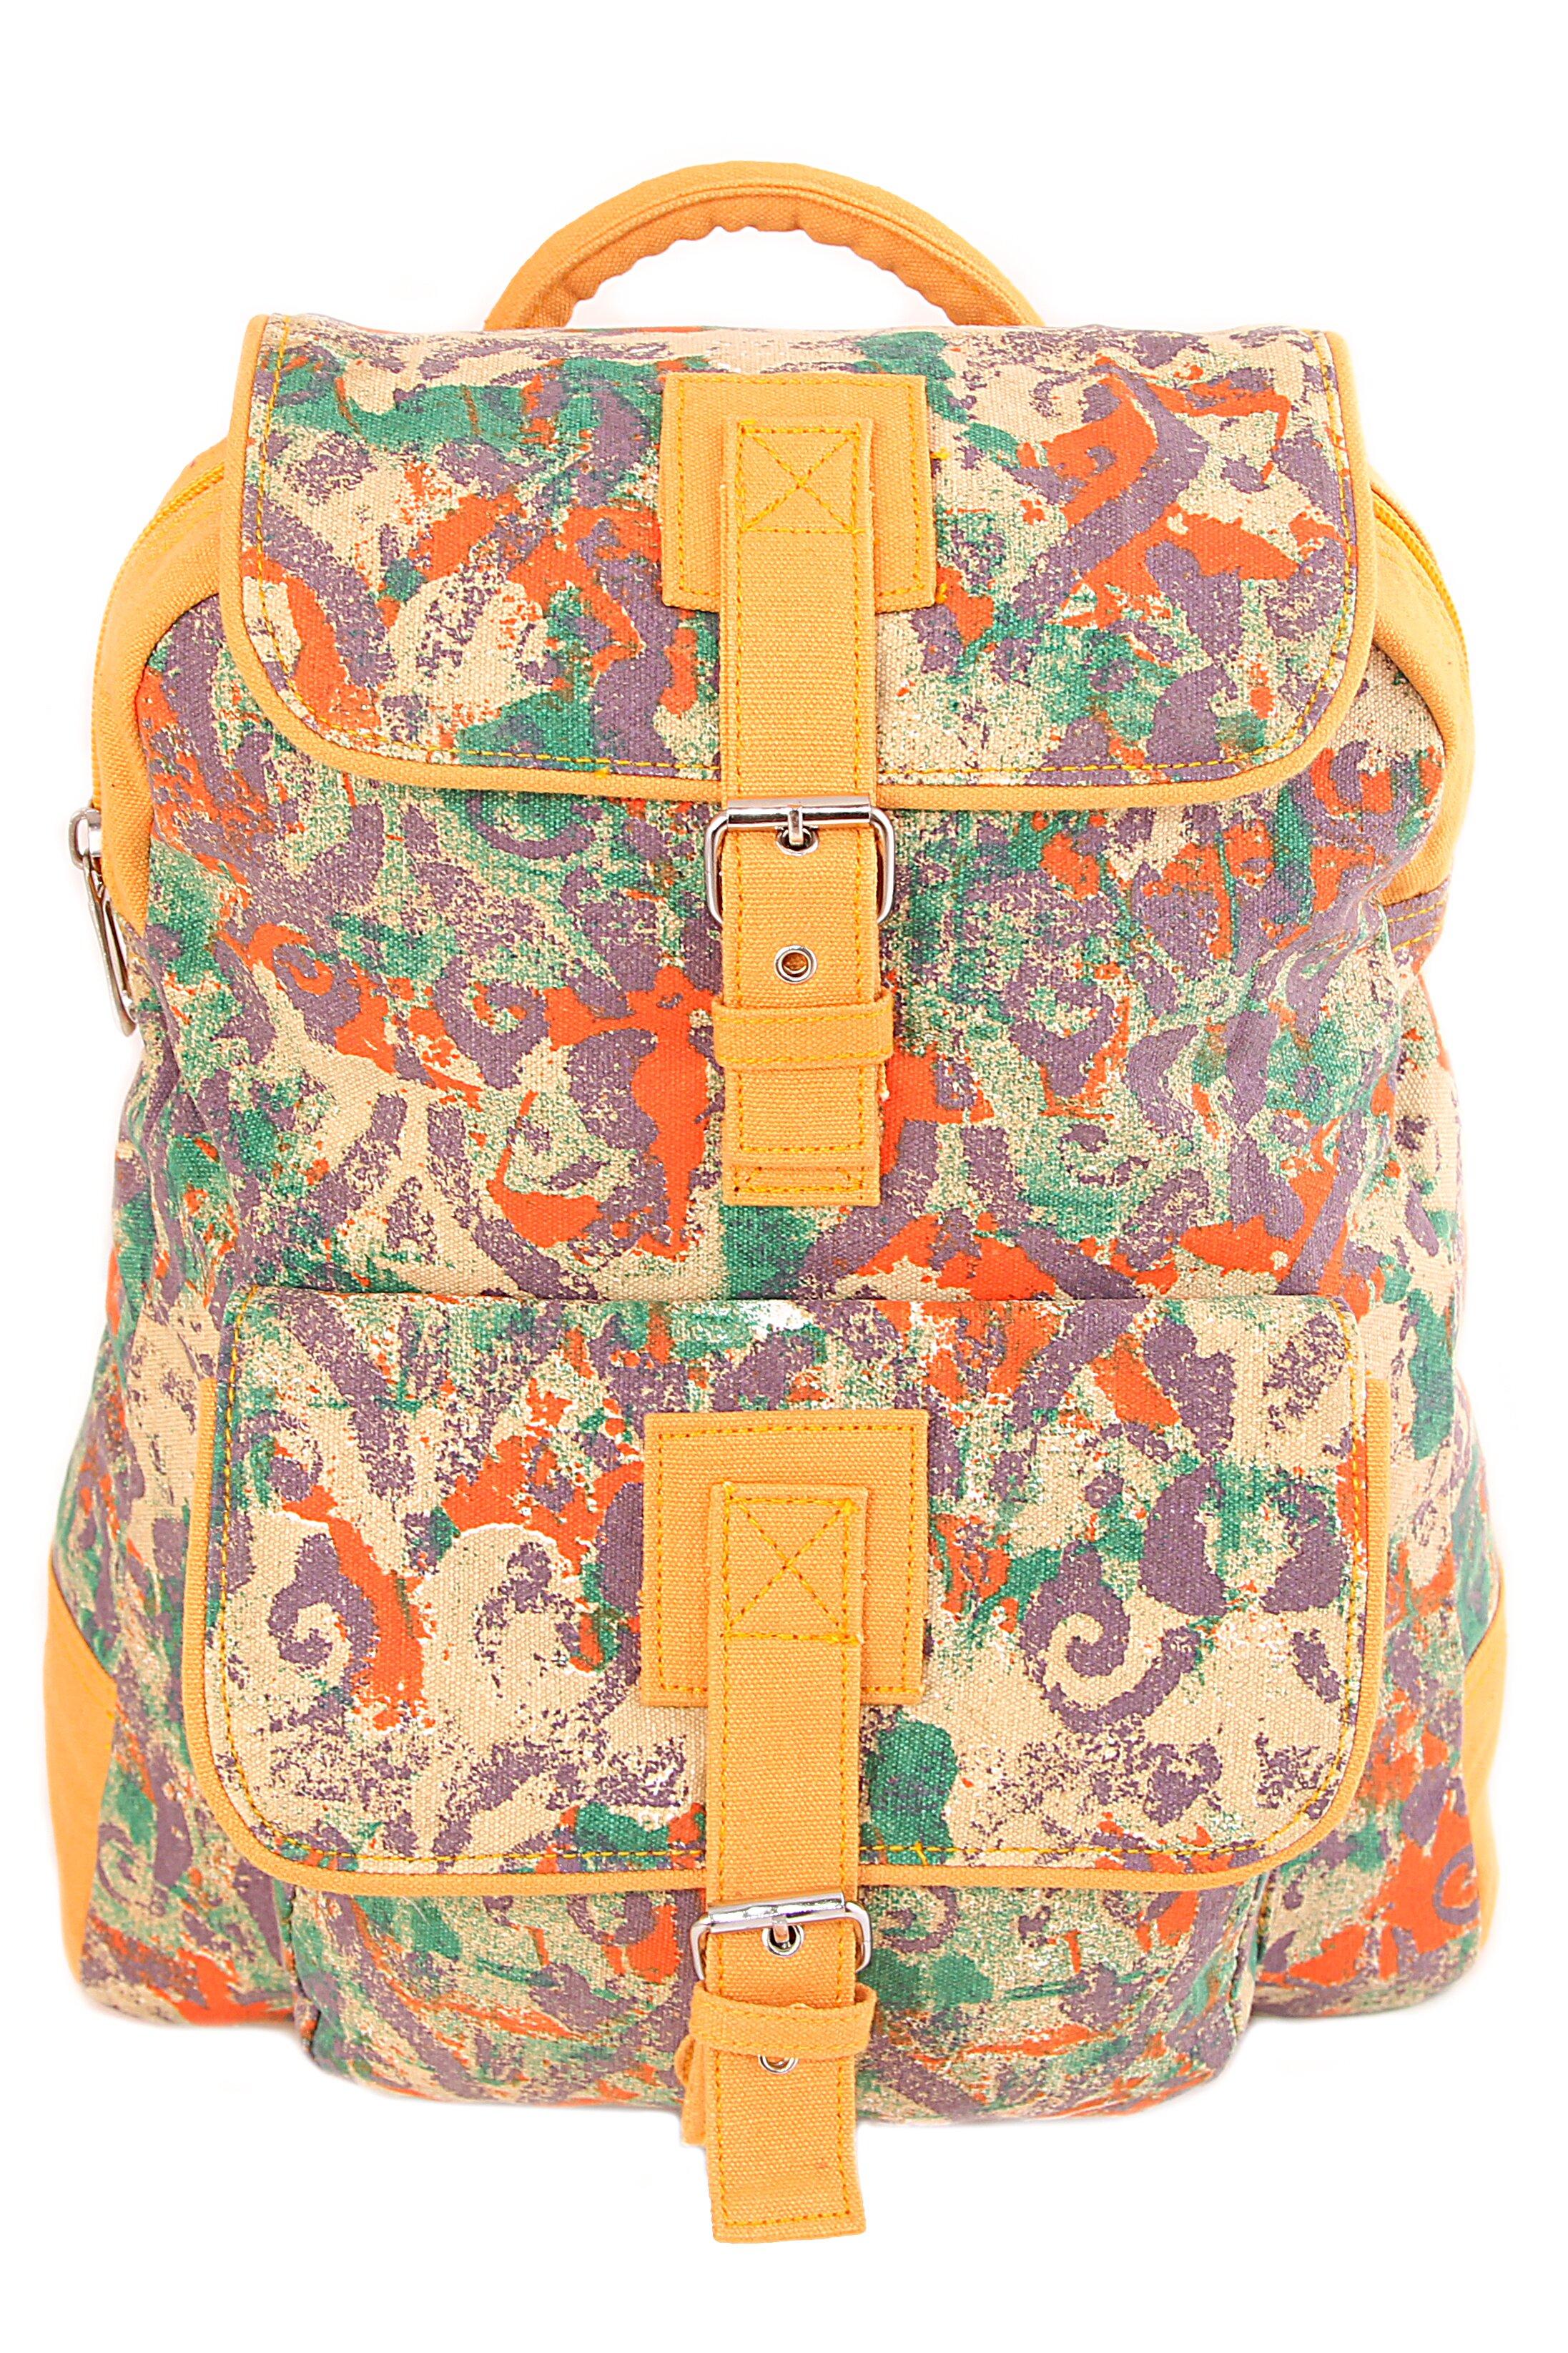 {} Ганг Рюкзак Pinar  (13х30х36 см) салфетки вафельные pinar aplika 45x70 см 2 шт 1160168